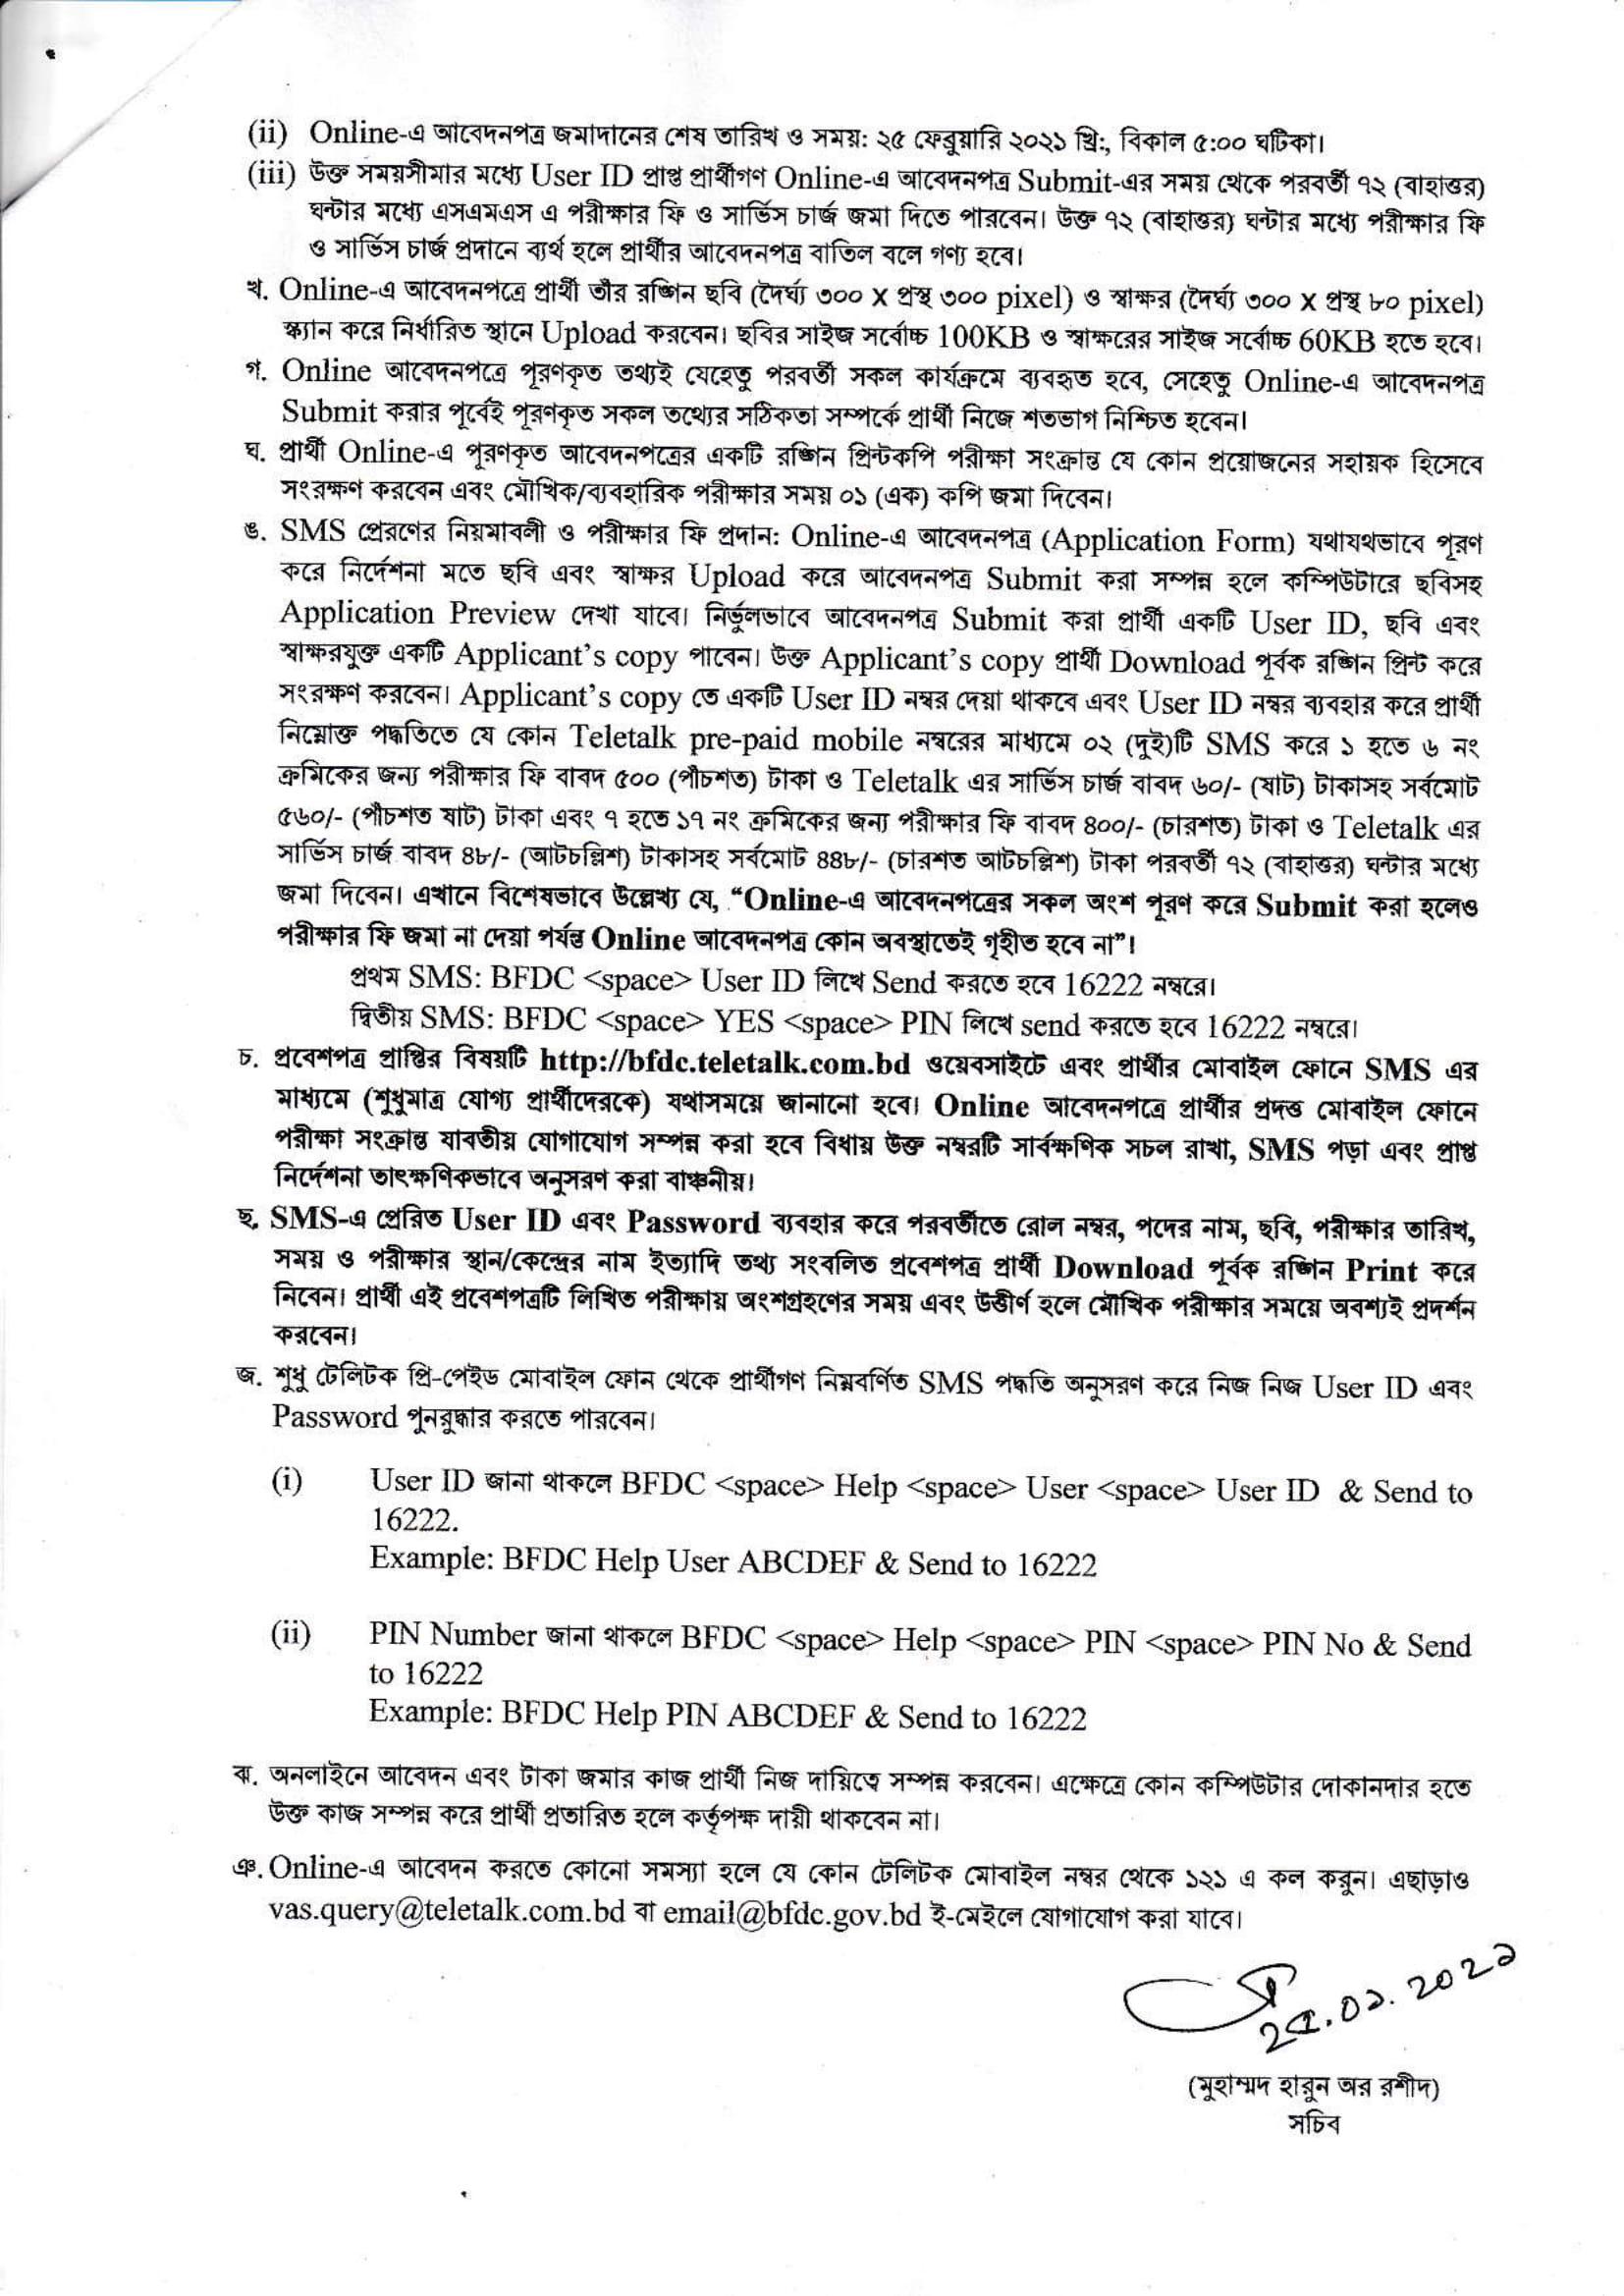 BFDC Teletalk Apply 2021 - bfdc.teletalk.com.bd